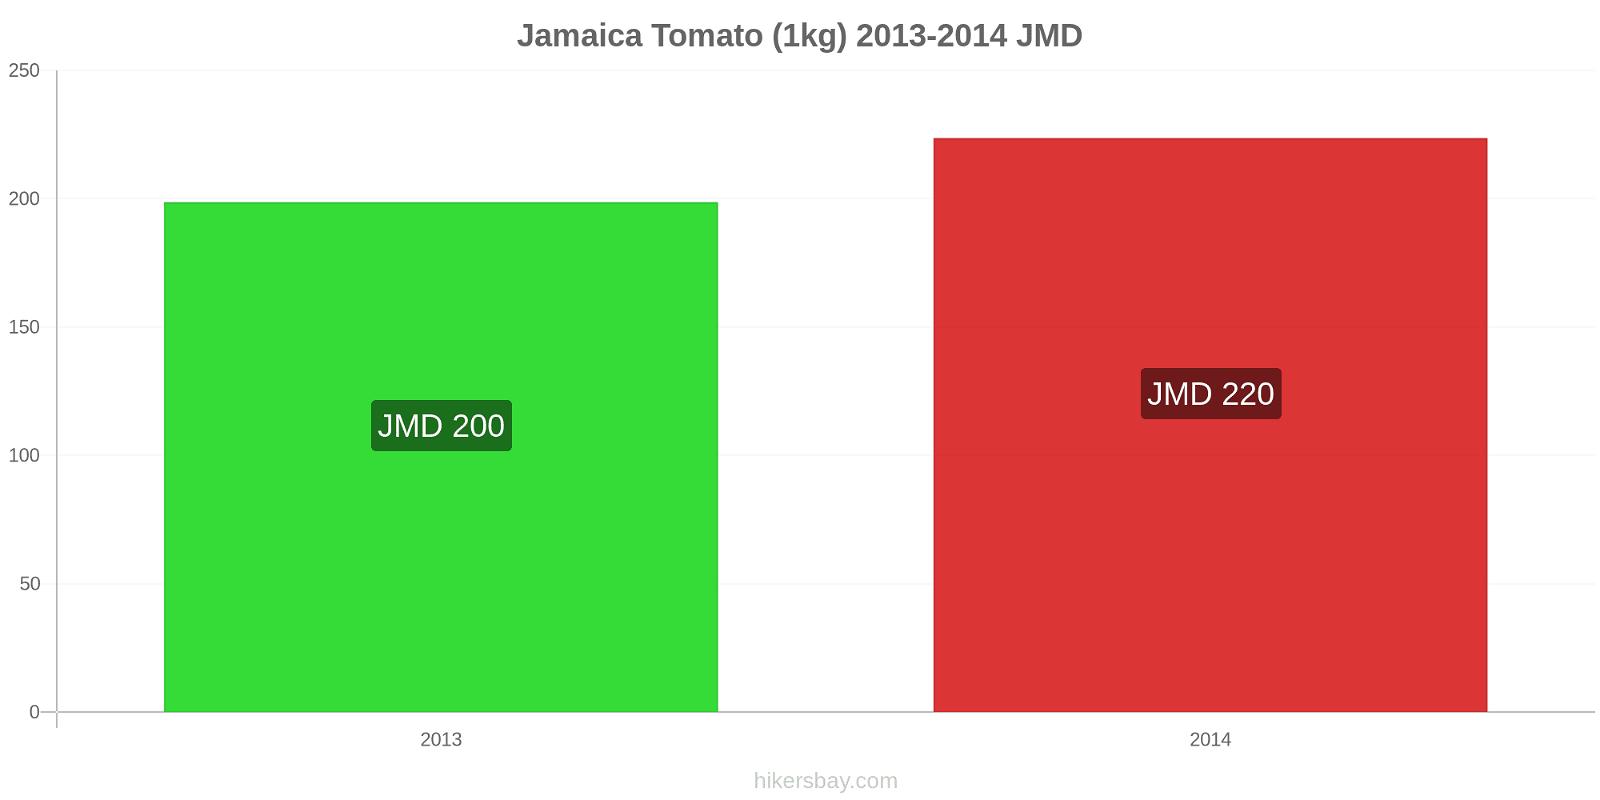 Jamaica price changes Tomato (1kg) hikersbay.com